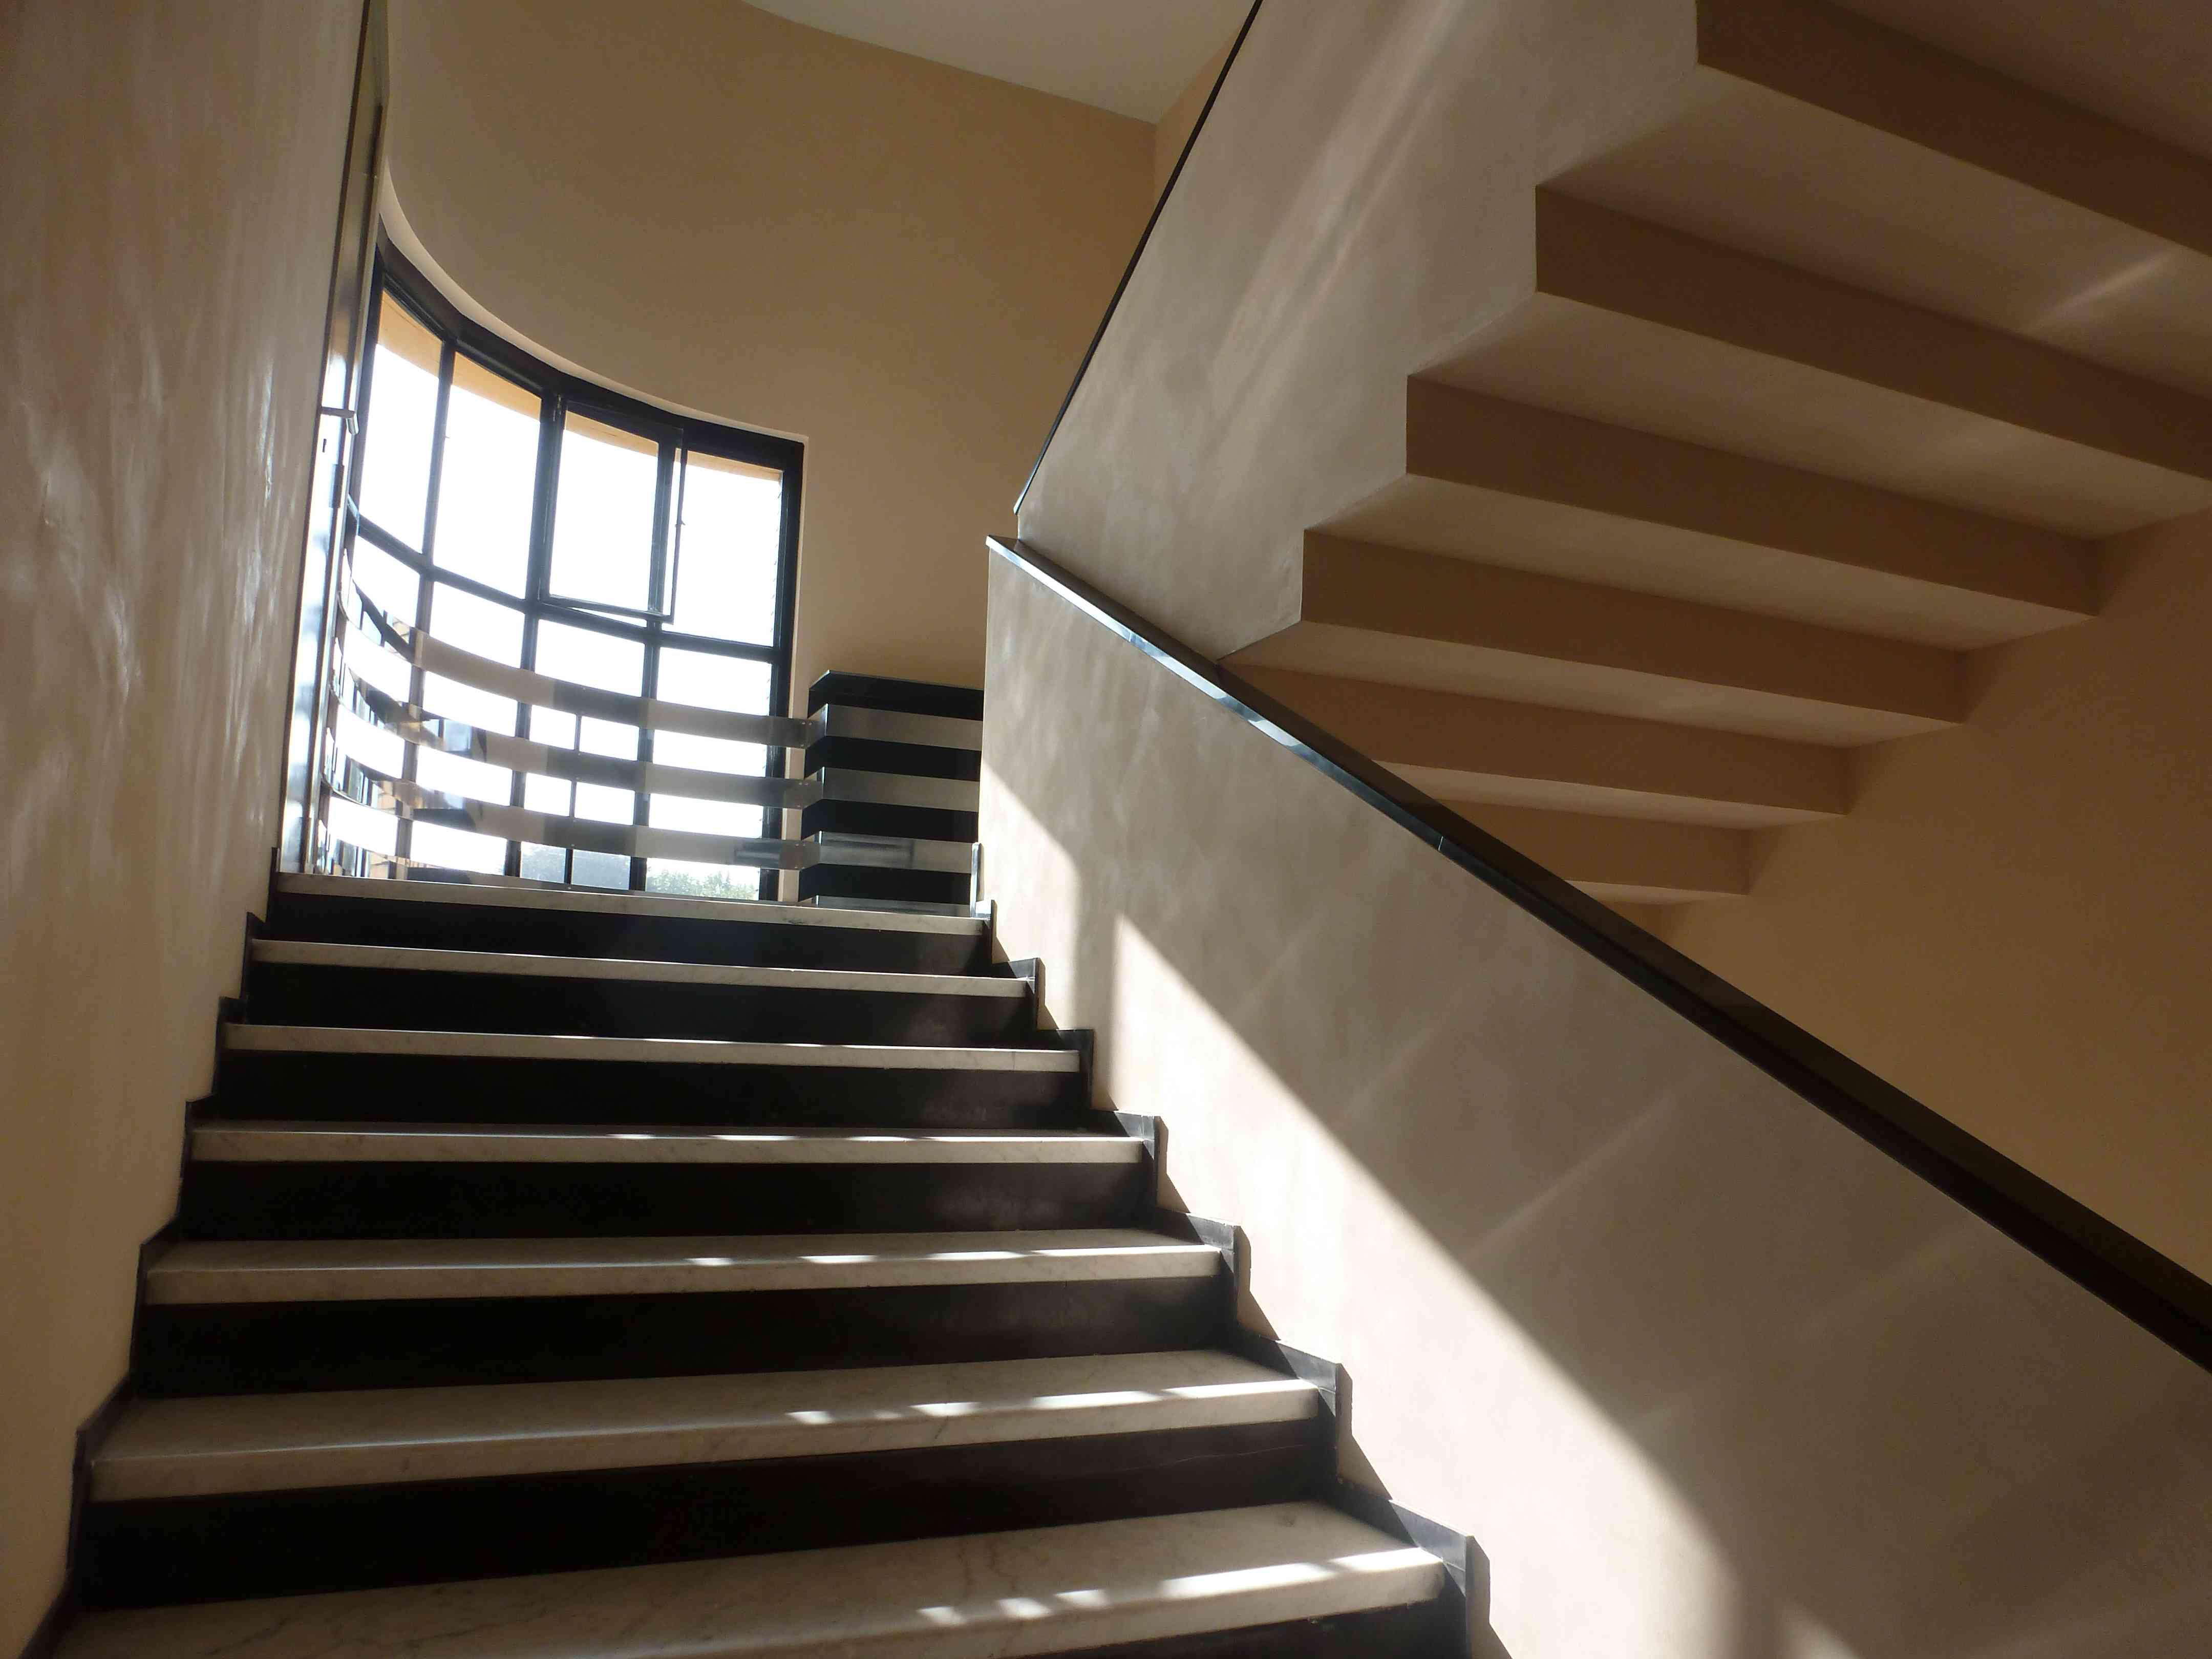 Villa Cavrois Croix 09-2013 escalier